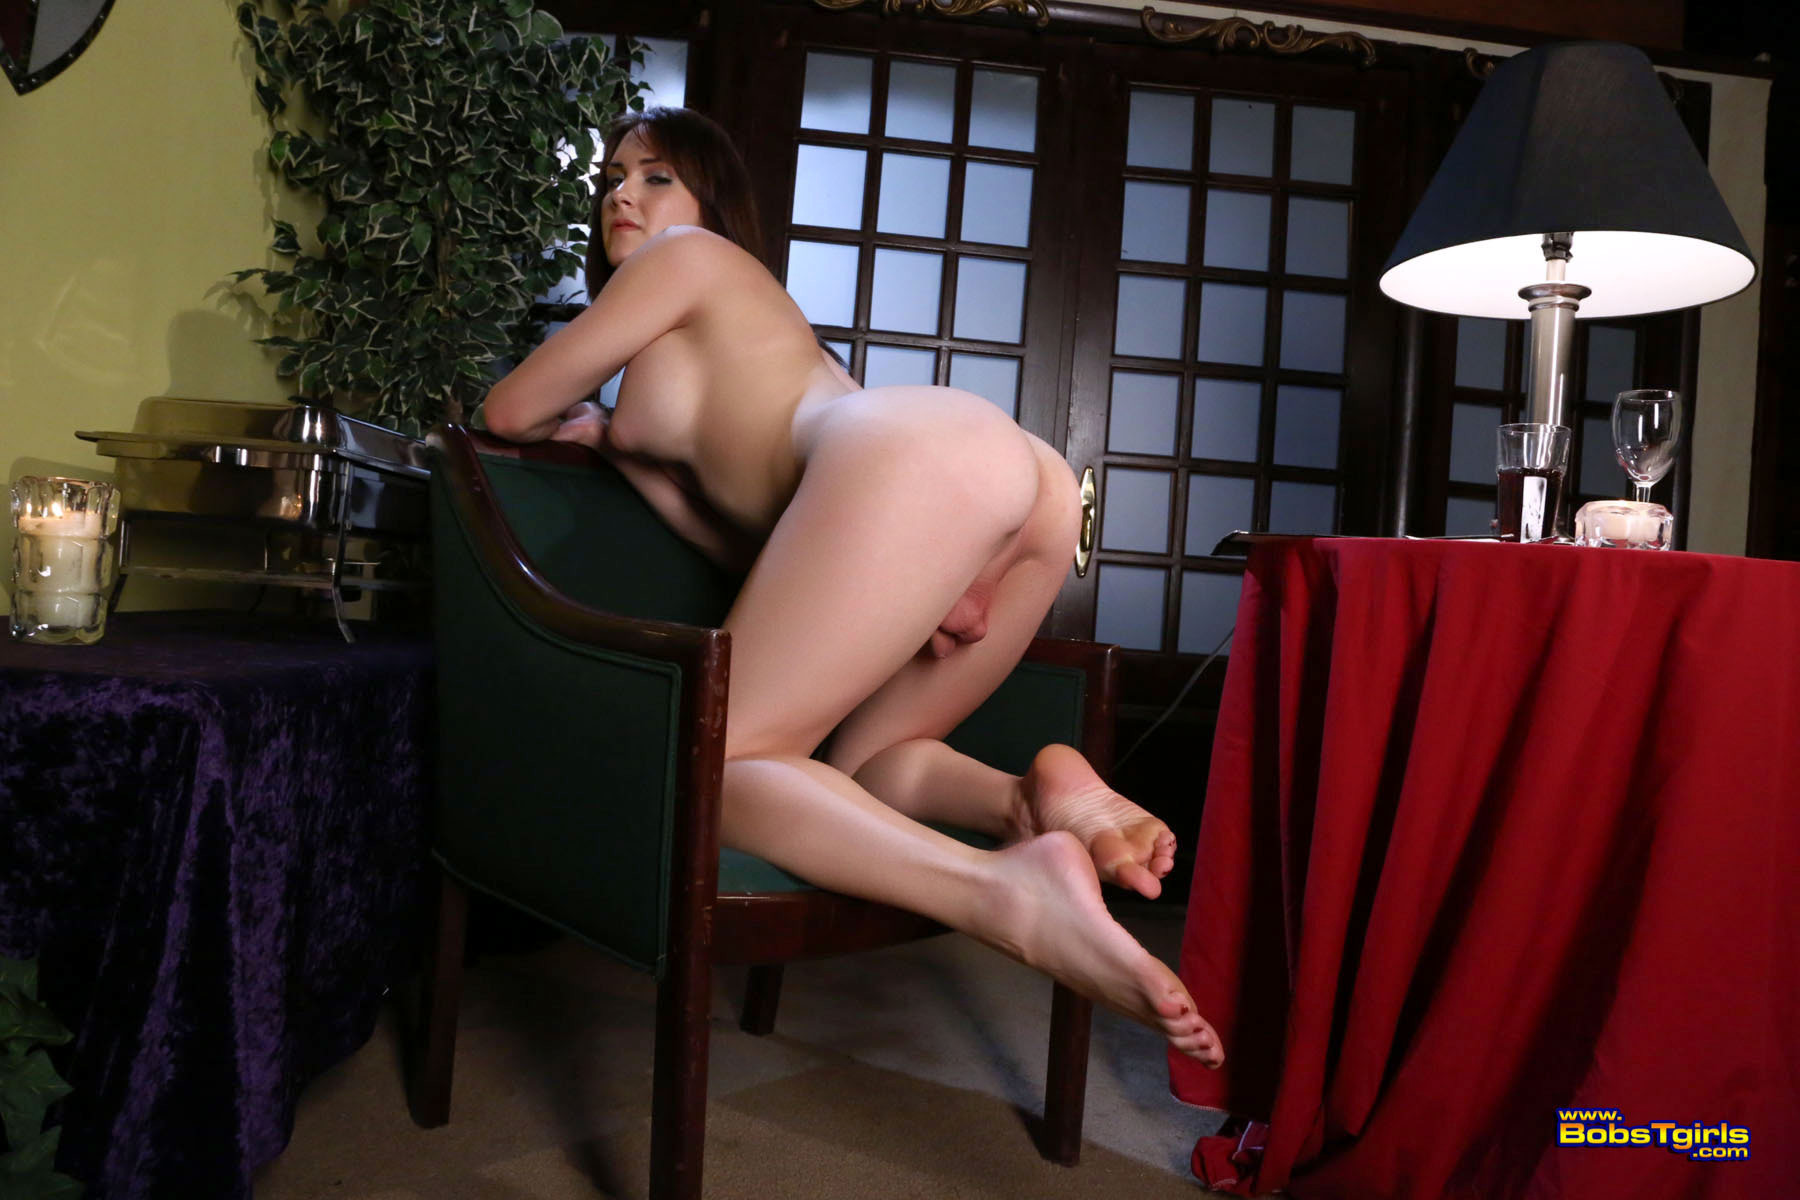 Hot Hazel Plays With Her Goodies